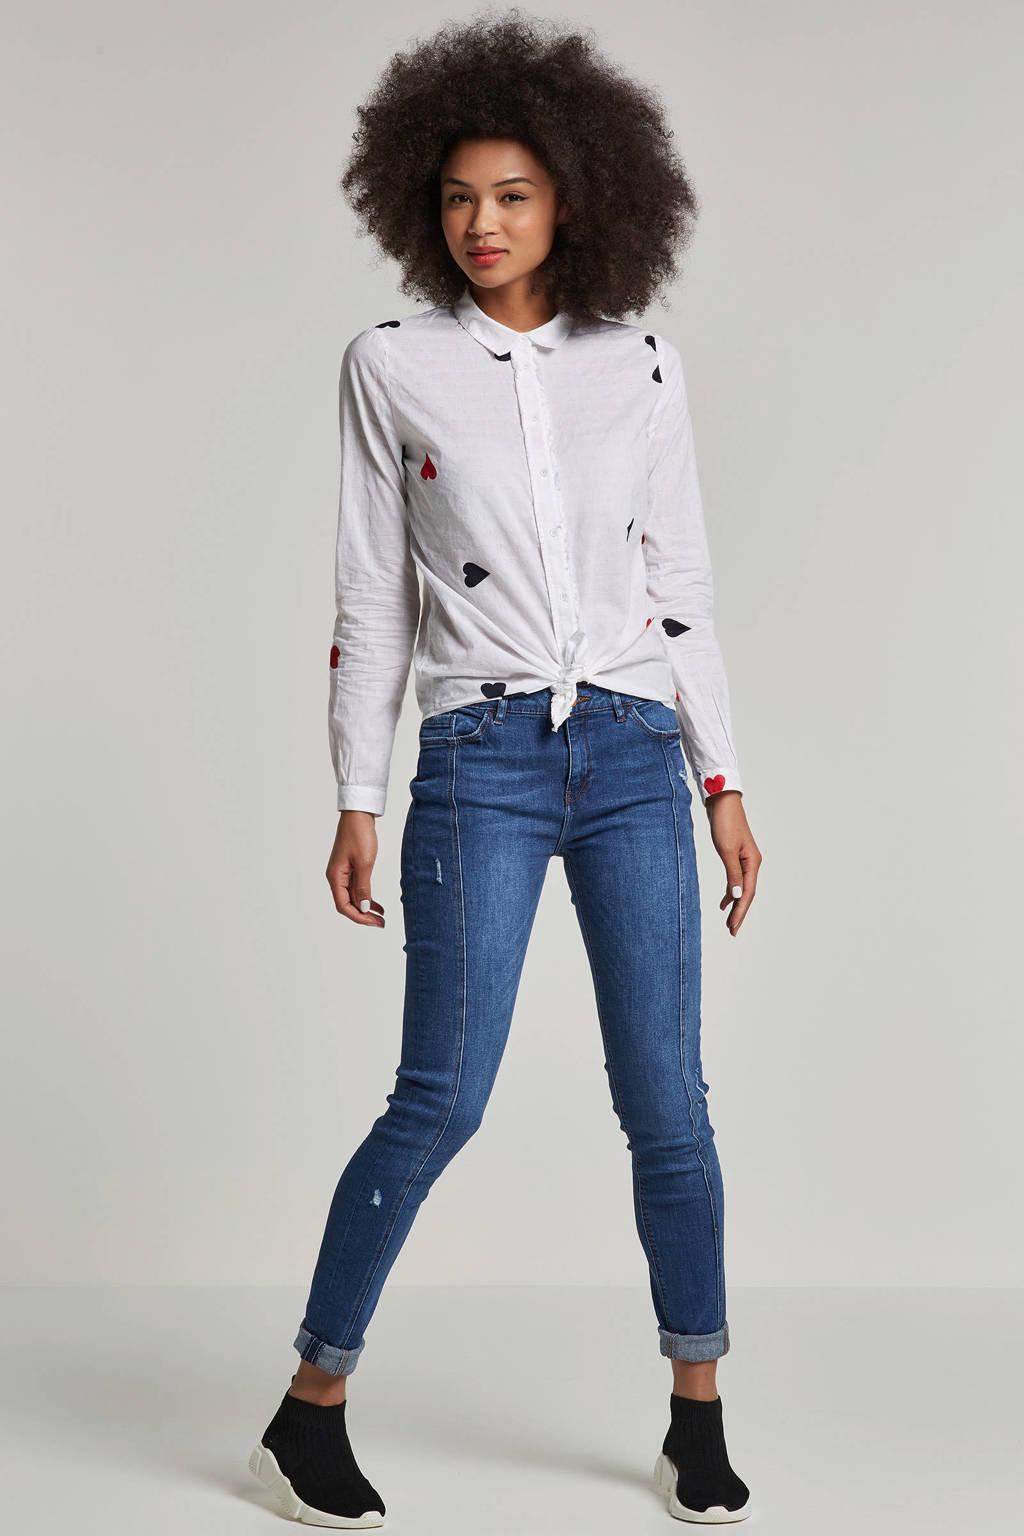 edc Women skinny jeans met borduursel en slijtage details, Blauw